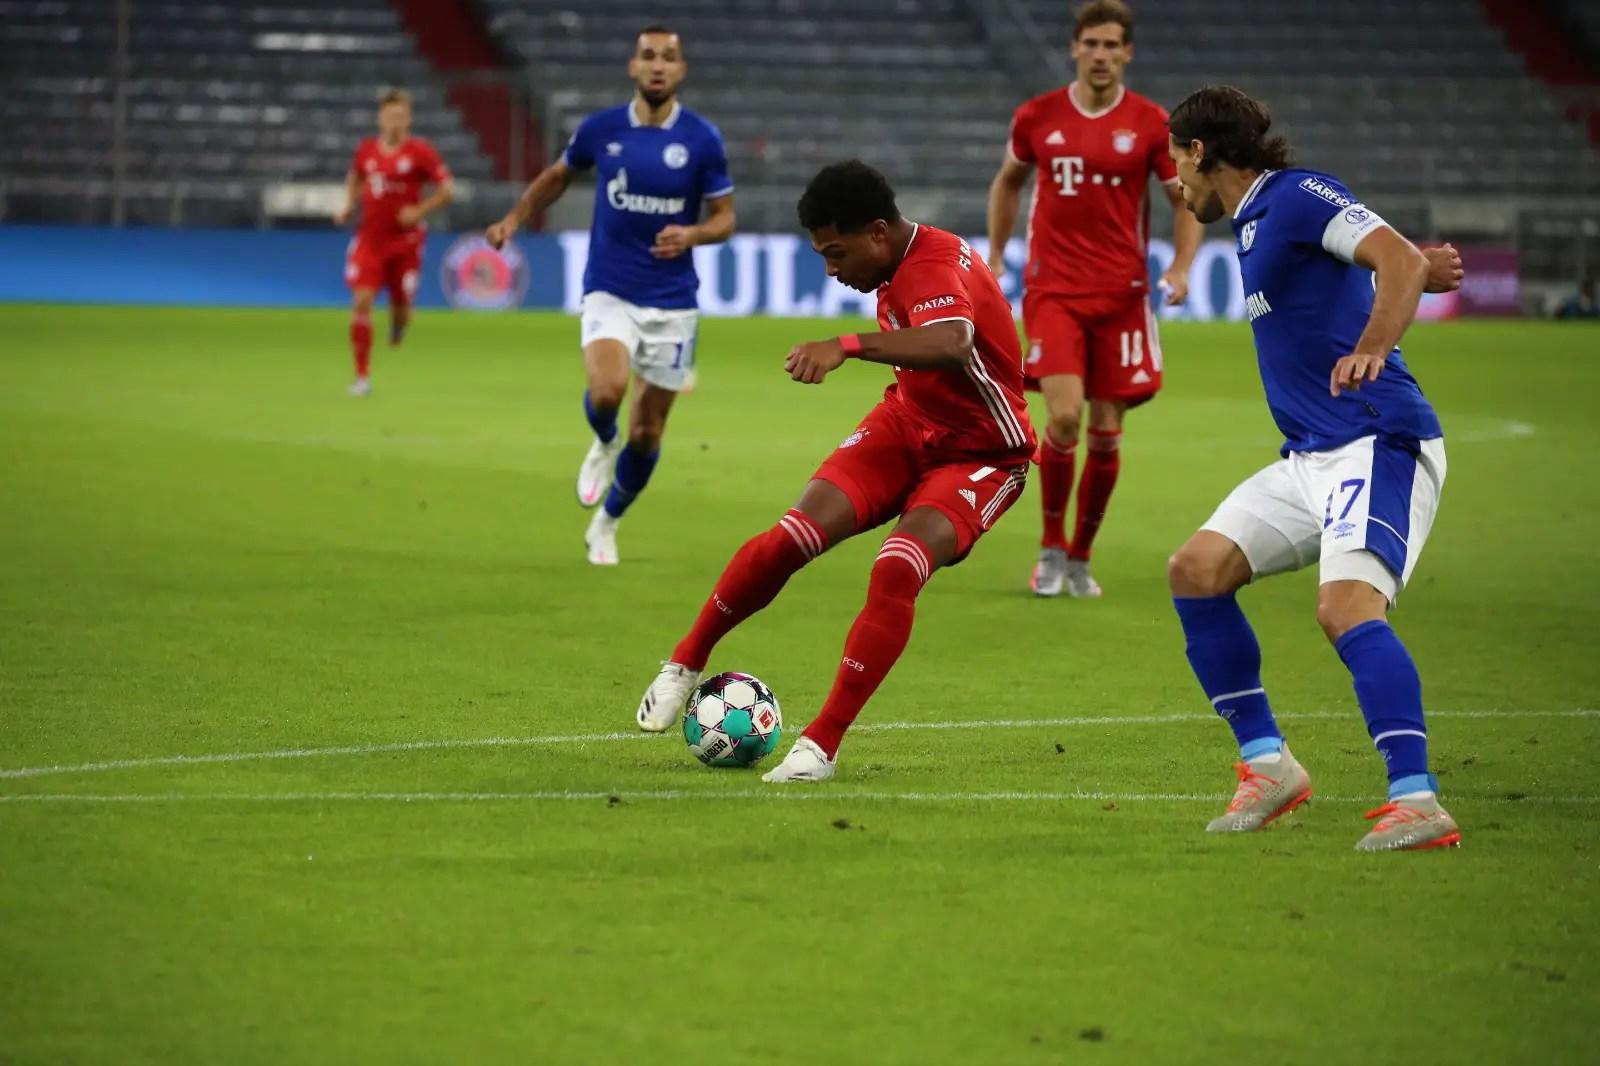 Bundesliga: Gnabry Nets Hat-Trick As Ruthless Bayern Maul Schalke In Season Opener